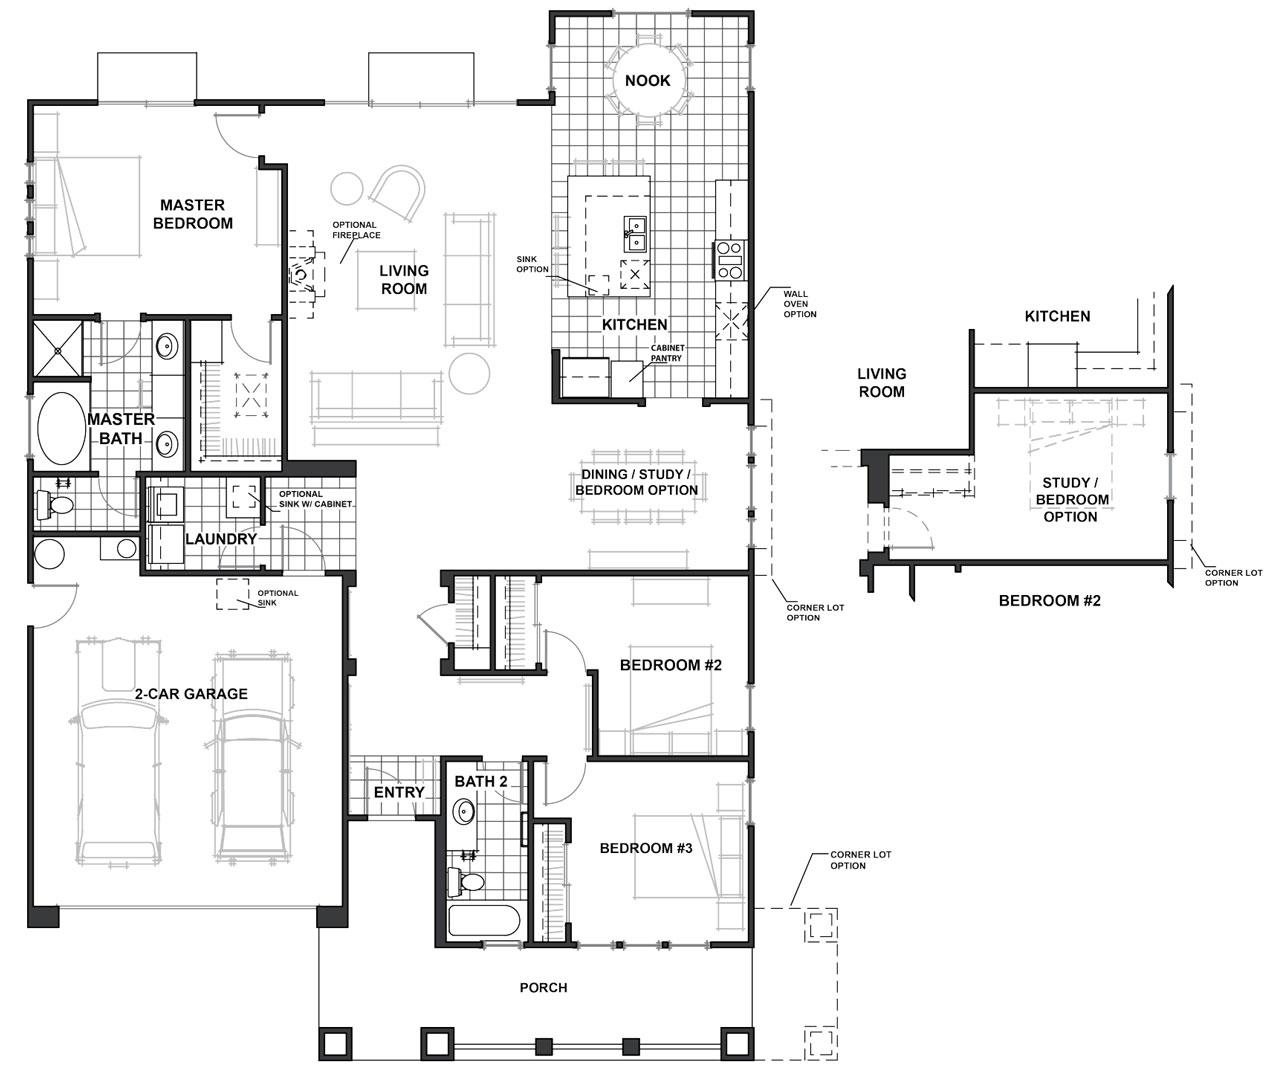 marysville floor plan - Jkb Homes Floor Plans